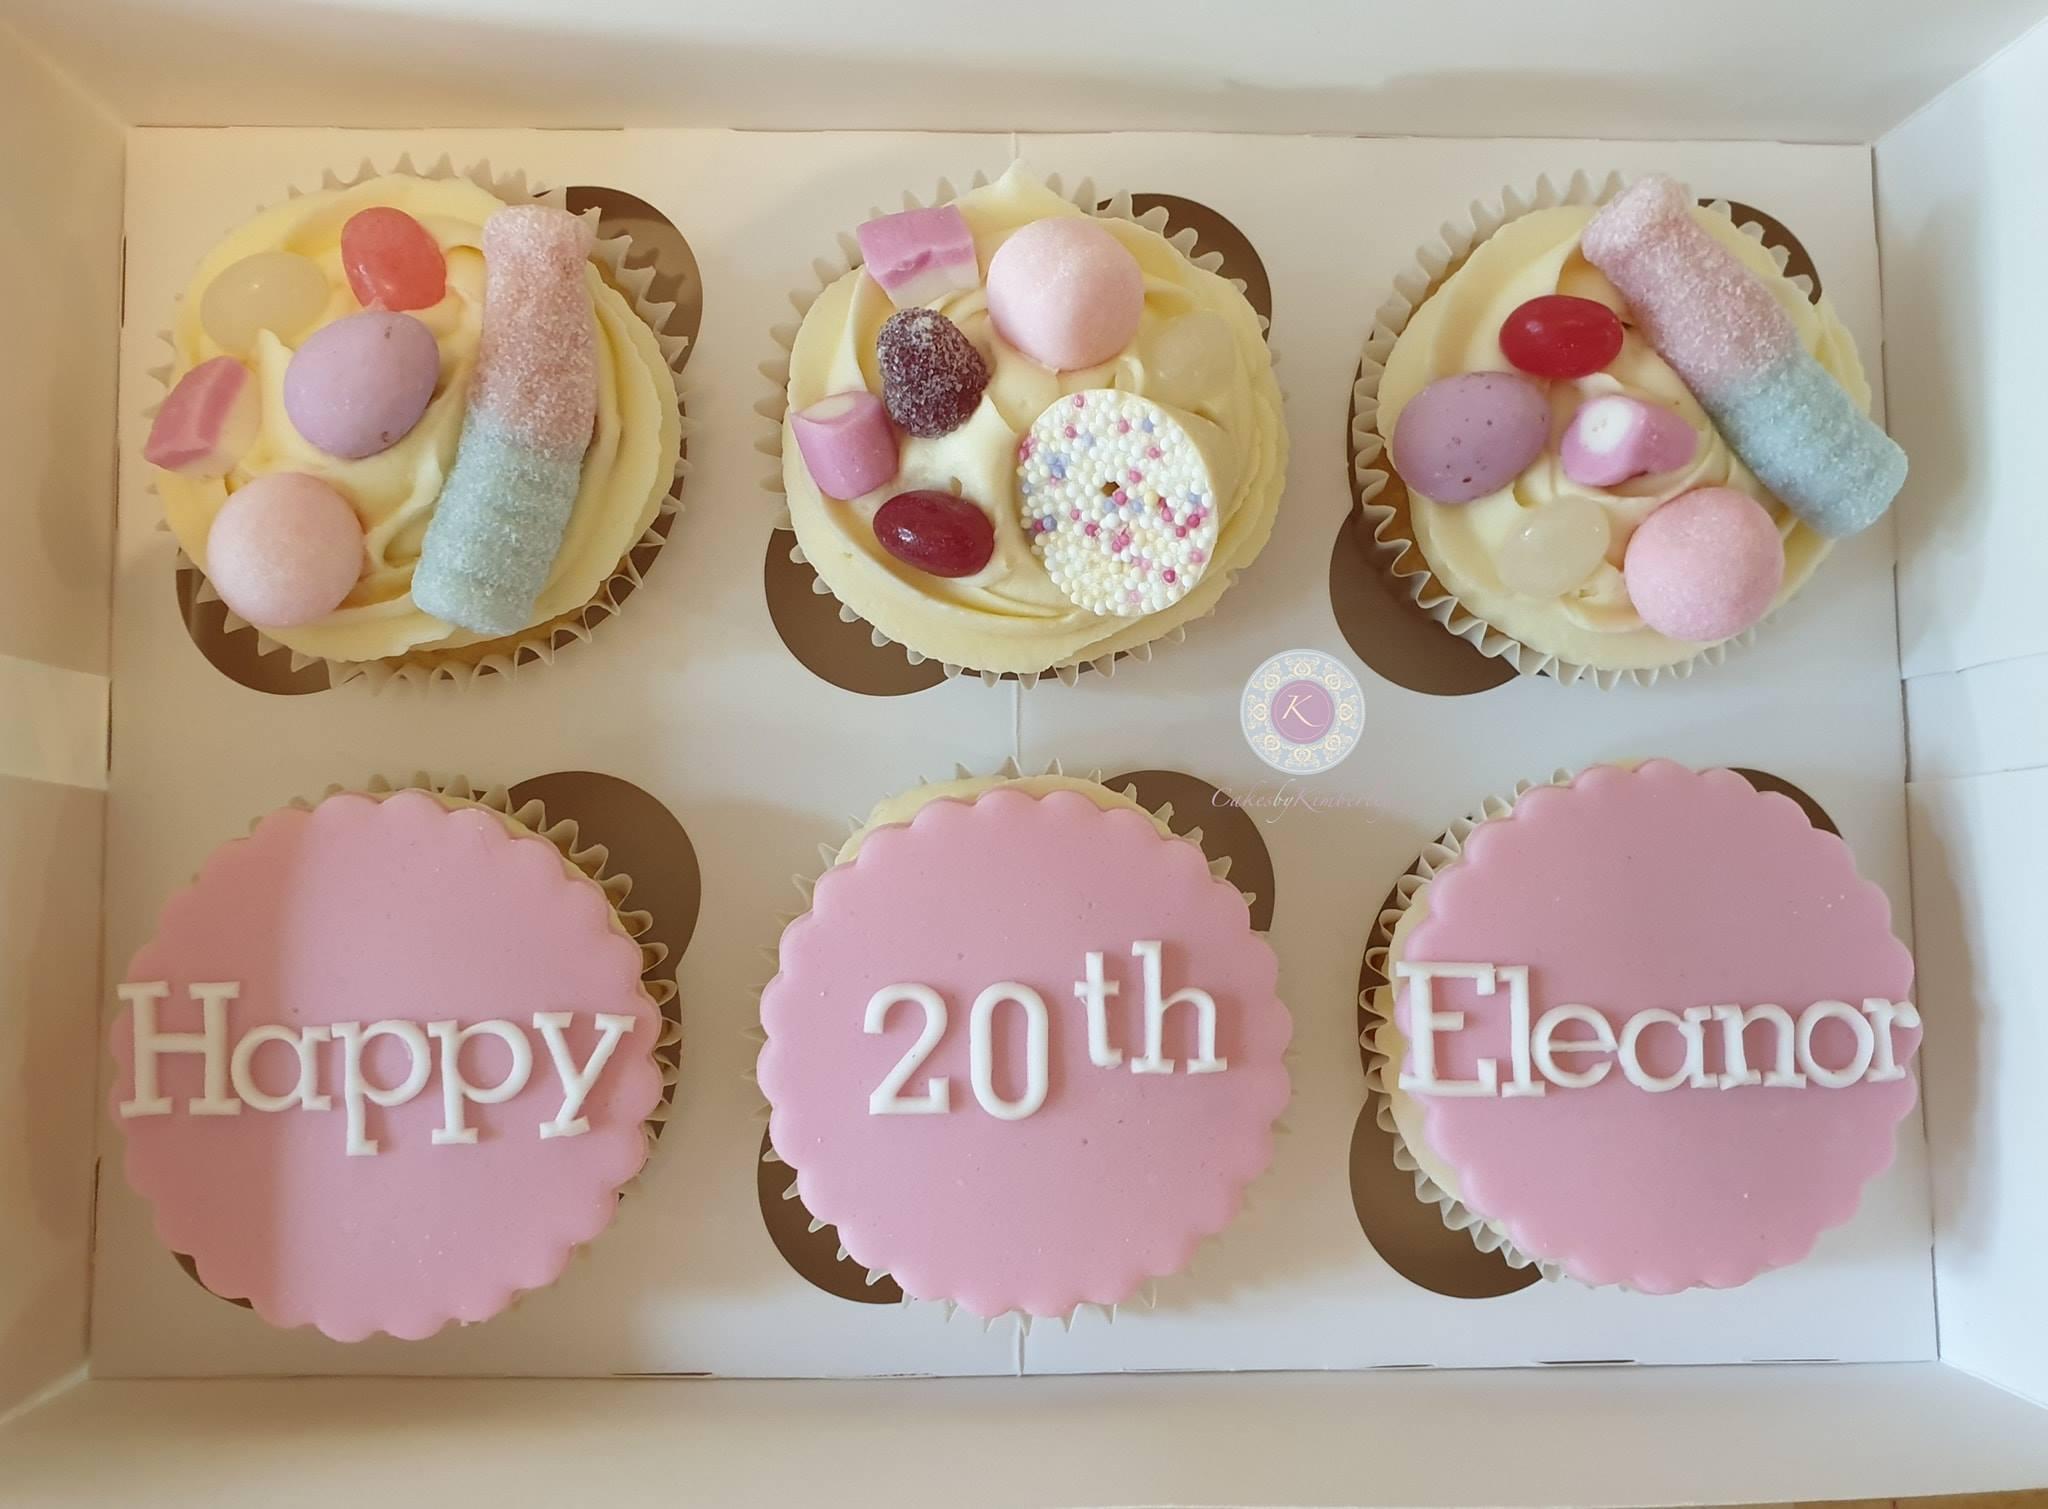 Cupcakes - Eleanor 20th